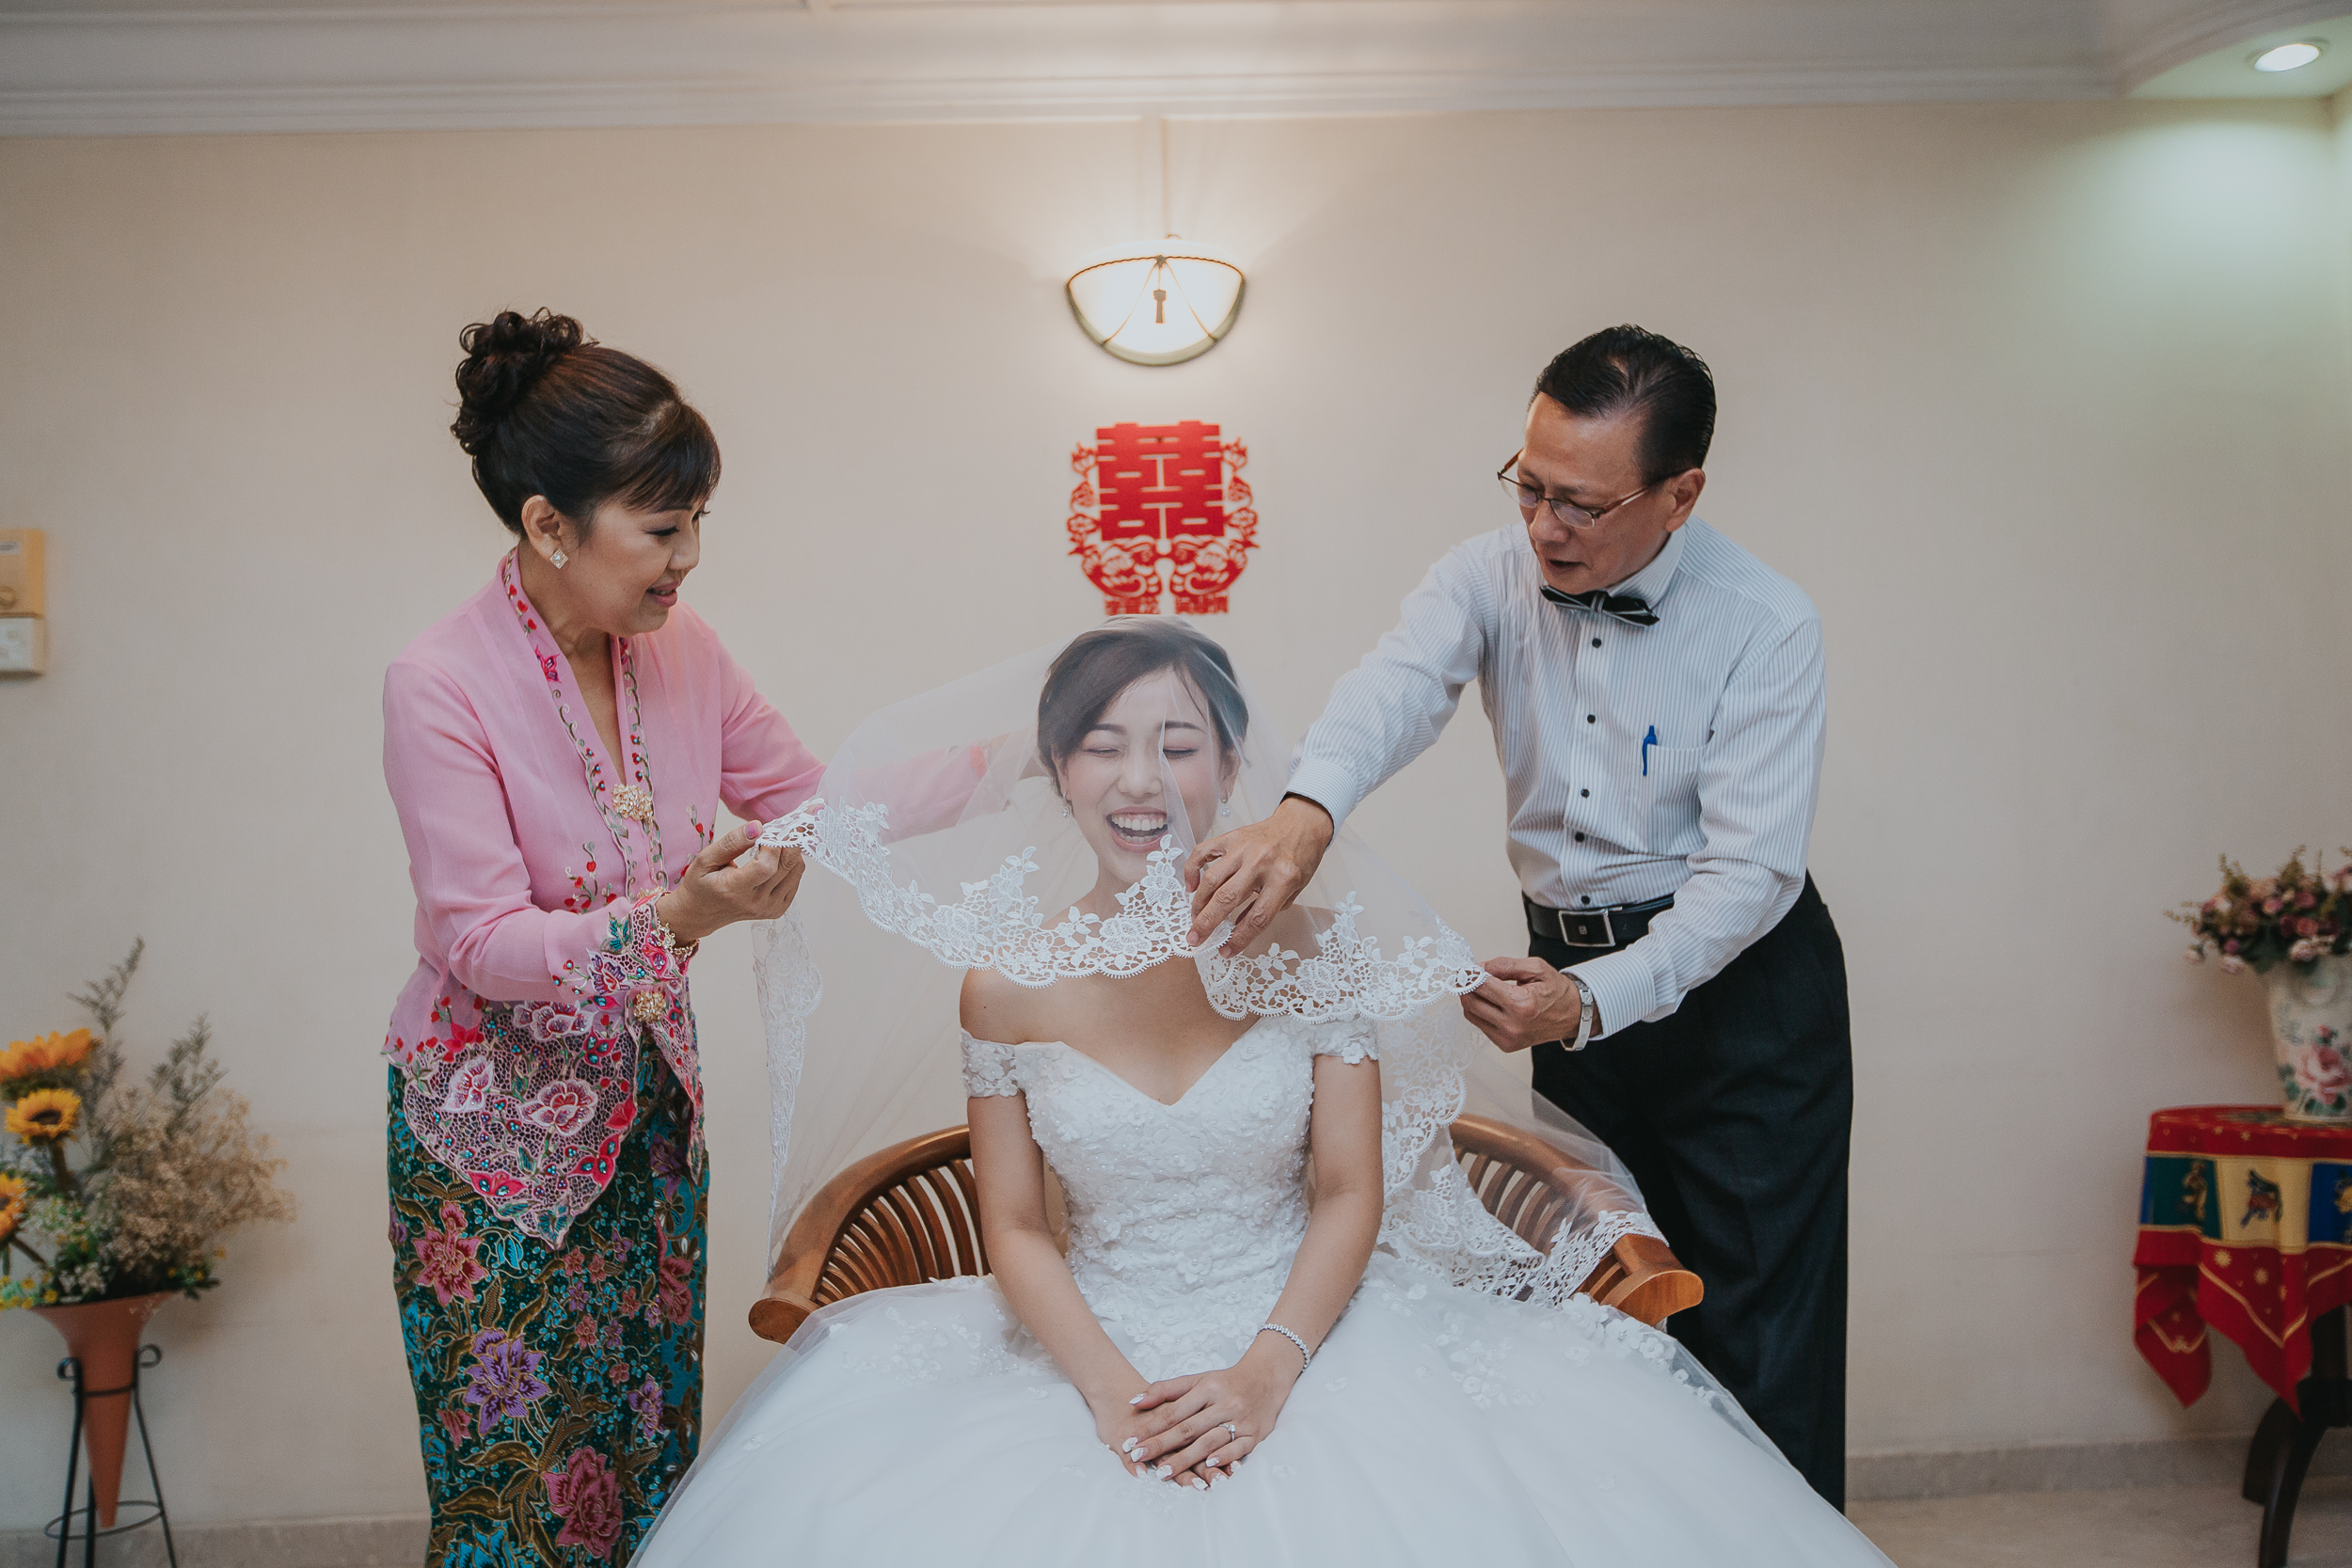 Singapore+Actual+Day+Wedding+Photographer+Grand+Mercure+Oliver+Estelle-0017.jpg